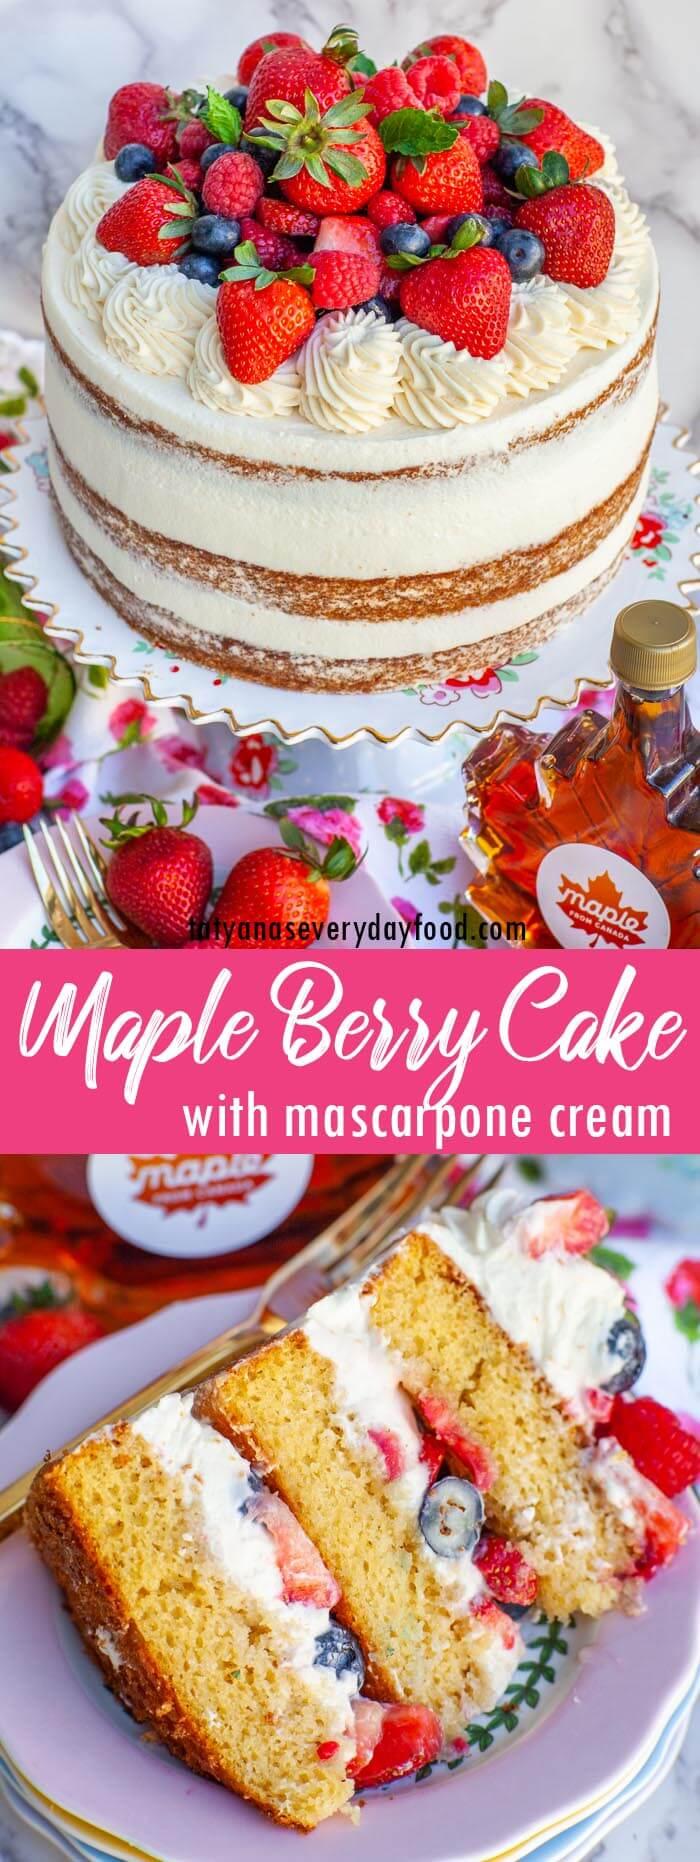 Maple Berry Cake video recipe